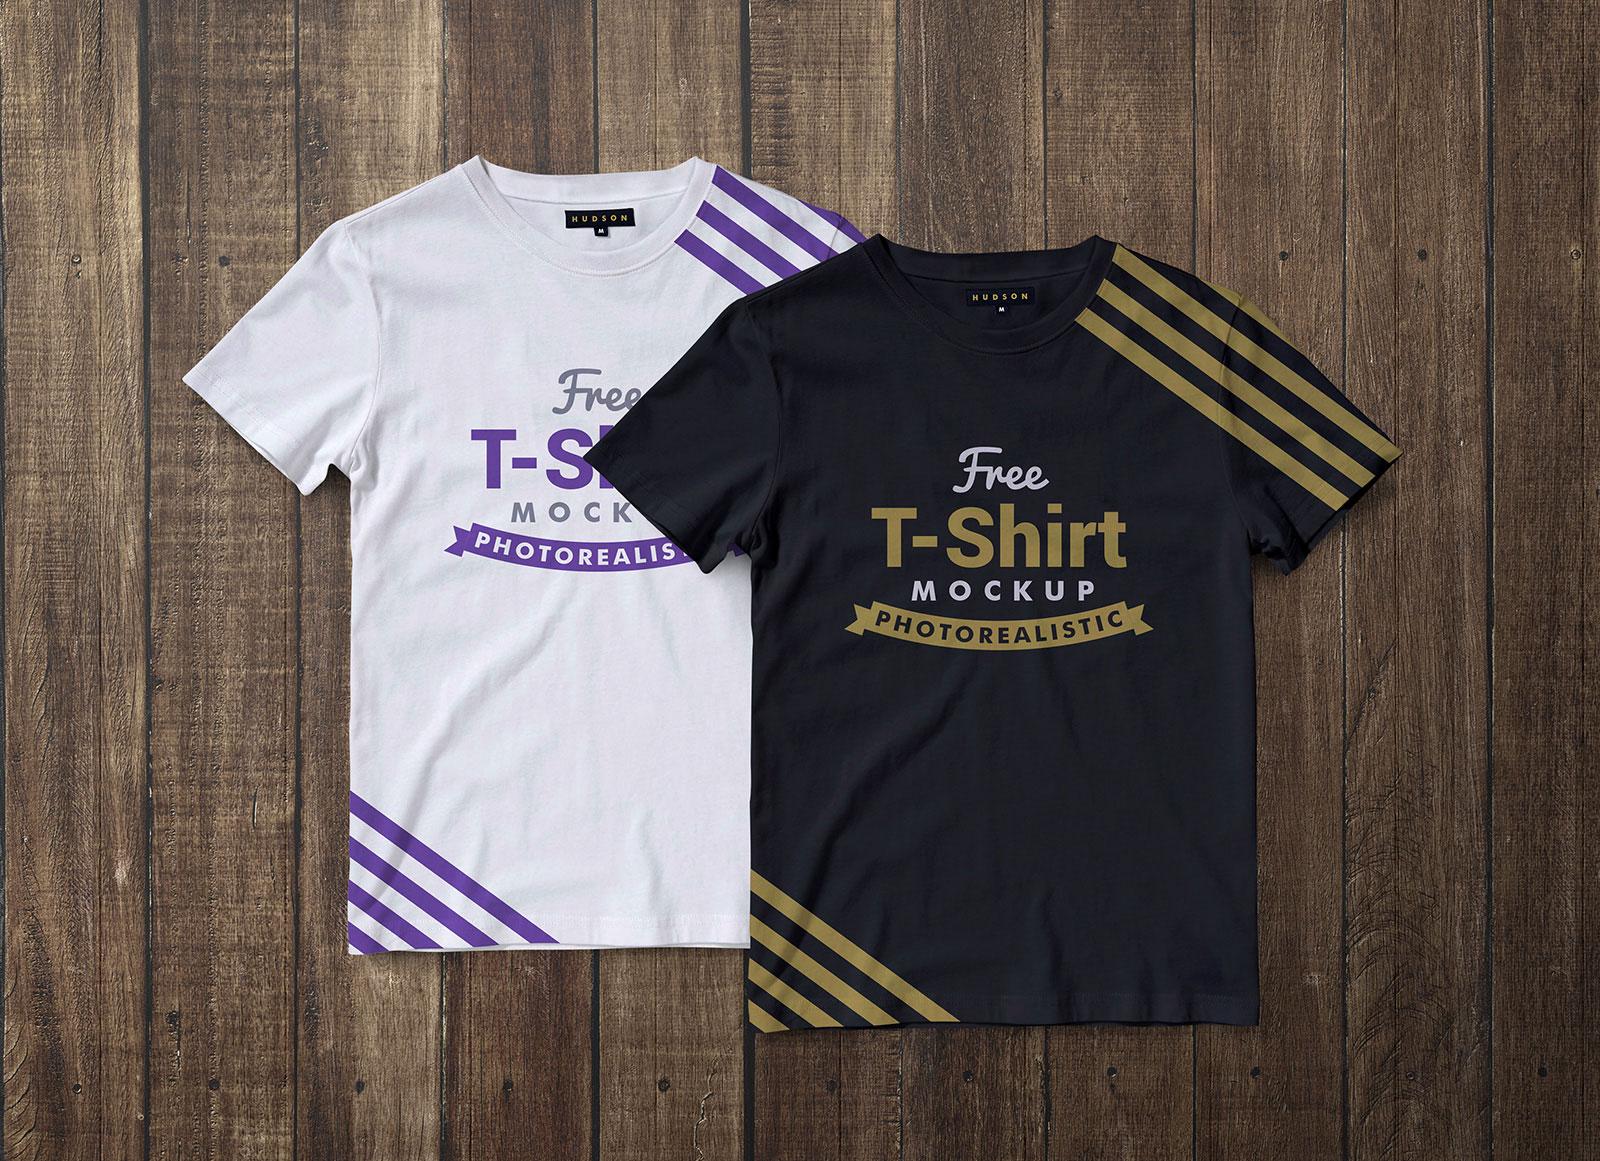 Free black white half sleeves t shirt mockup psd good mockups for Free tshirt mockup psd